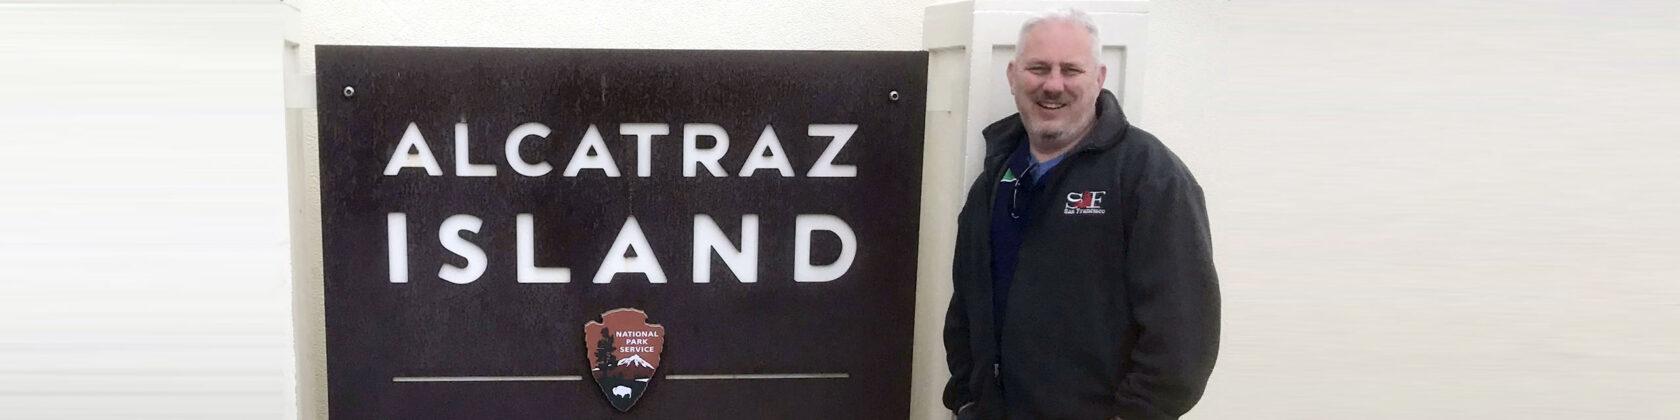 Mike Powell next to an Alcatraz Island sign